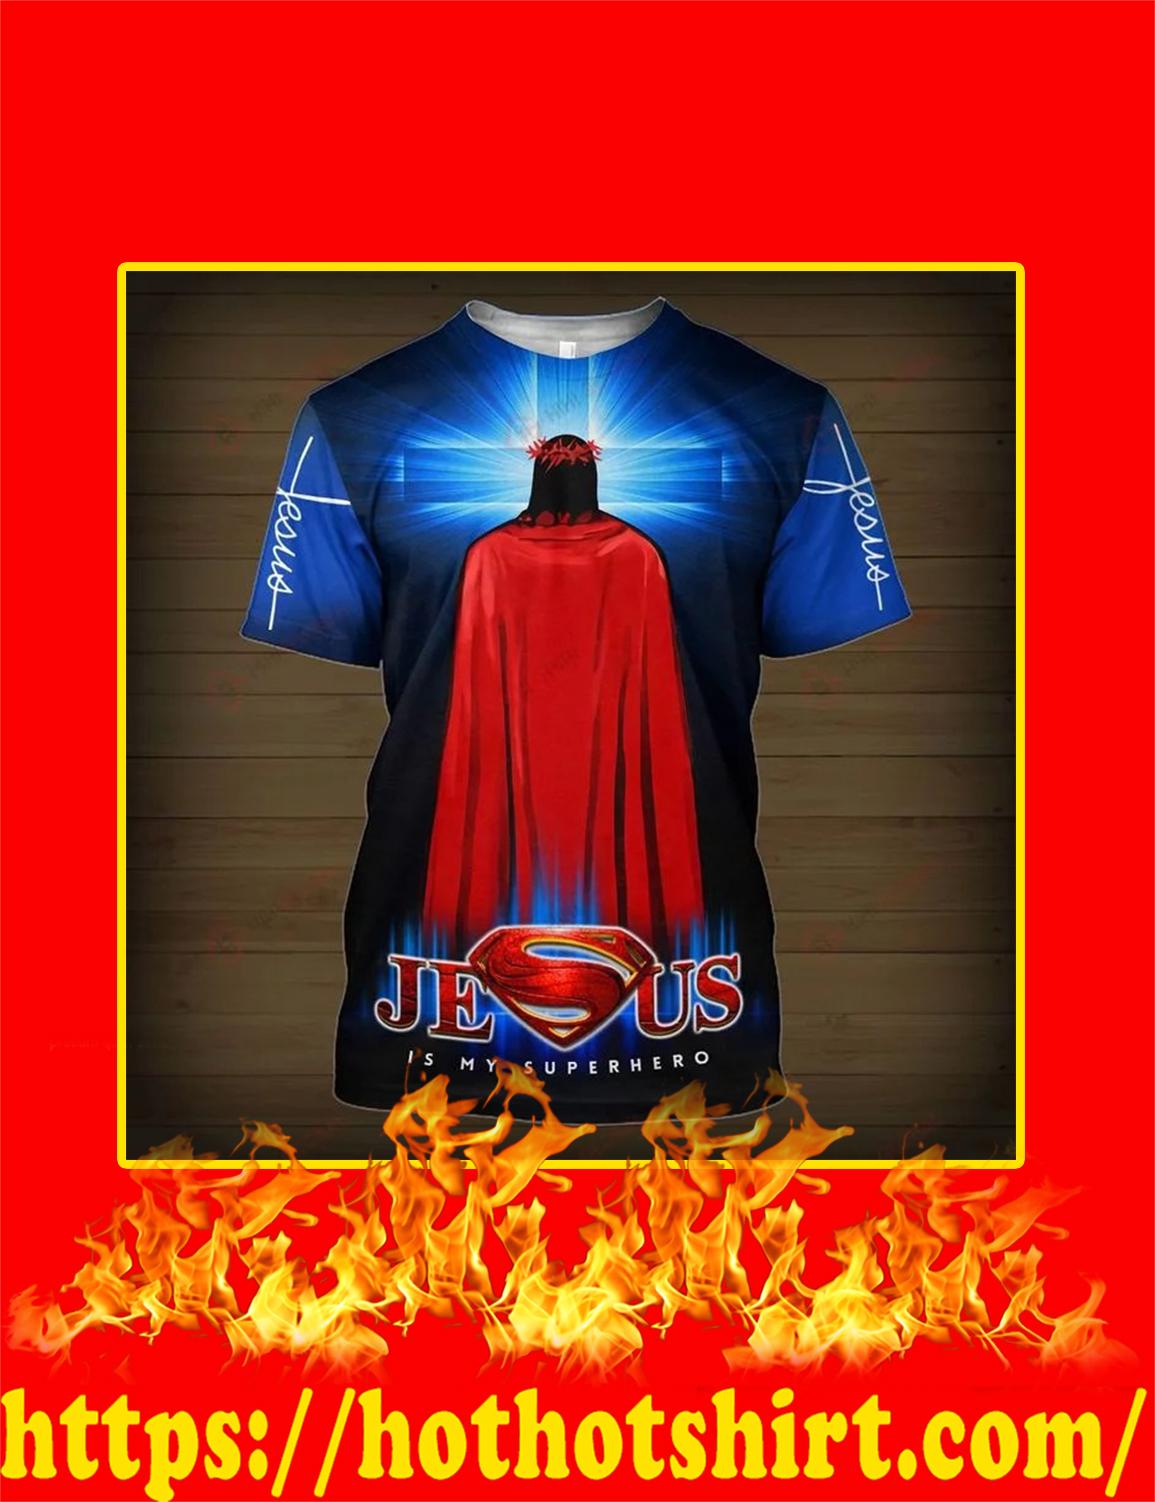 Jesus Is My Superhero 3d t-shirt